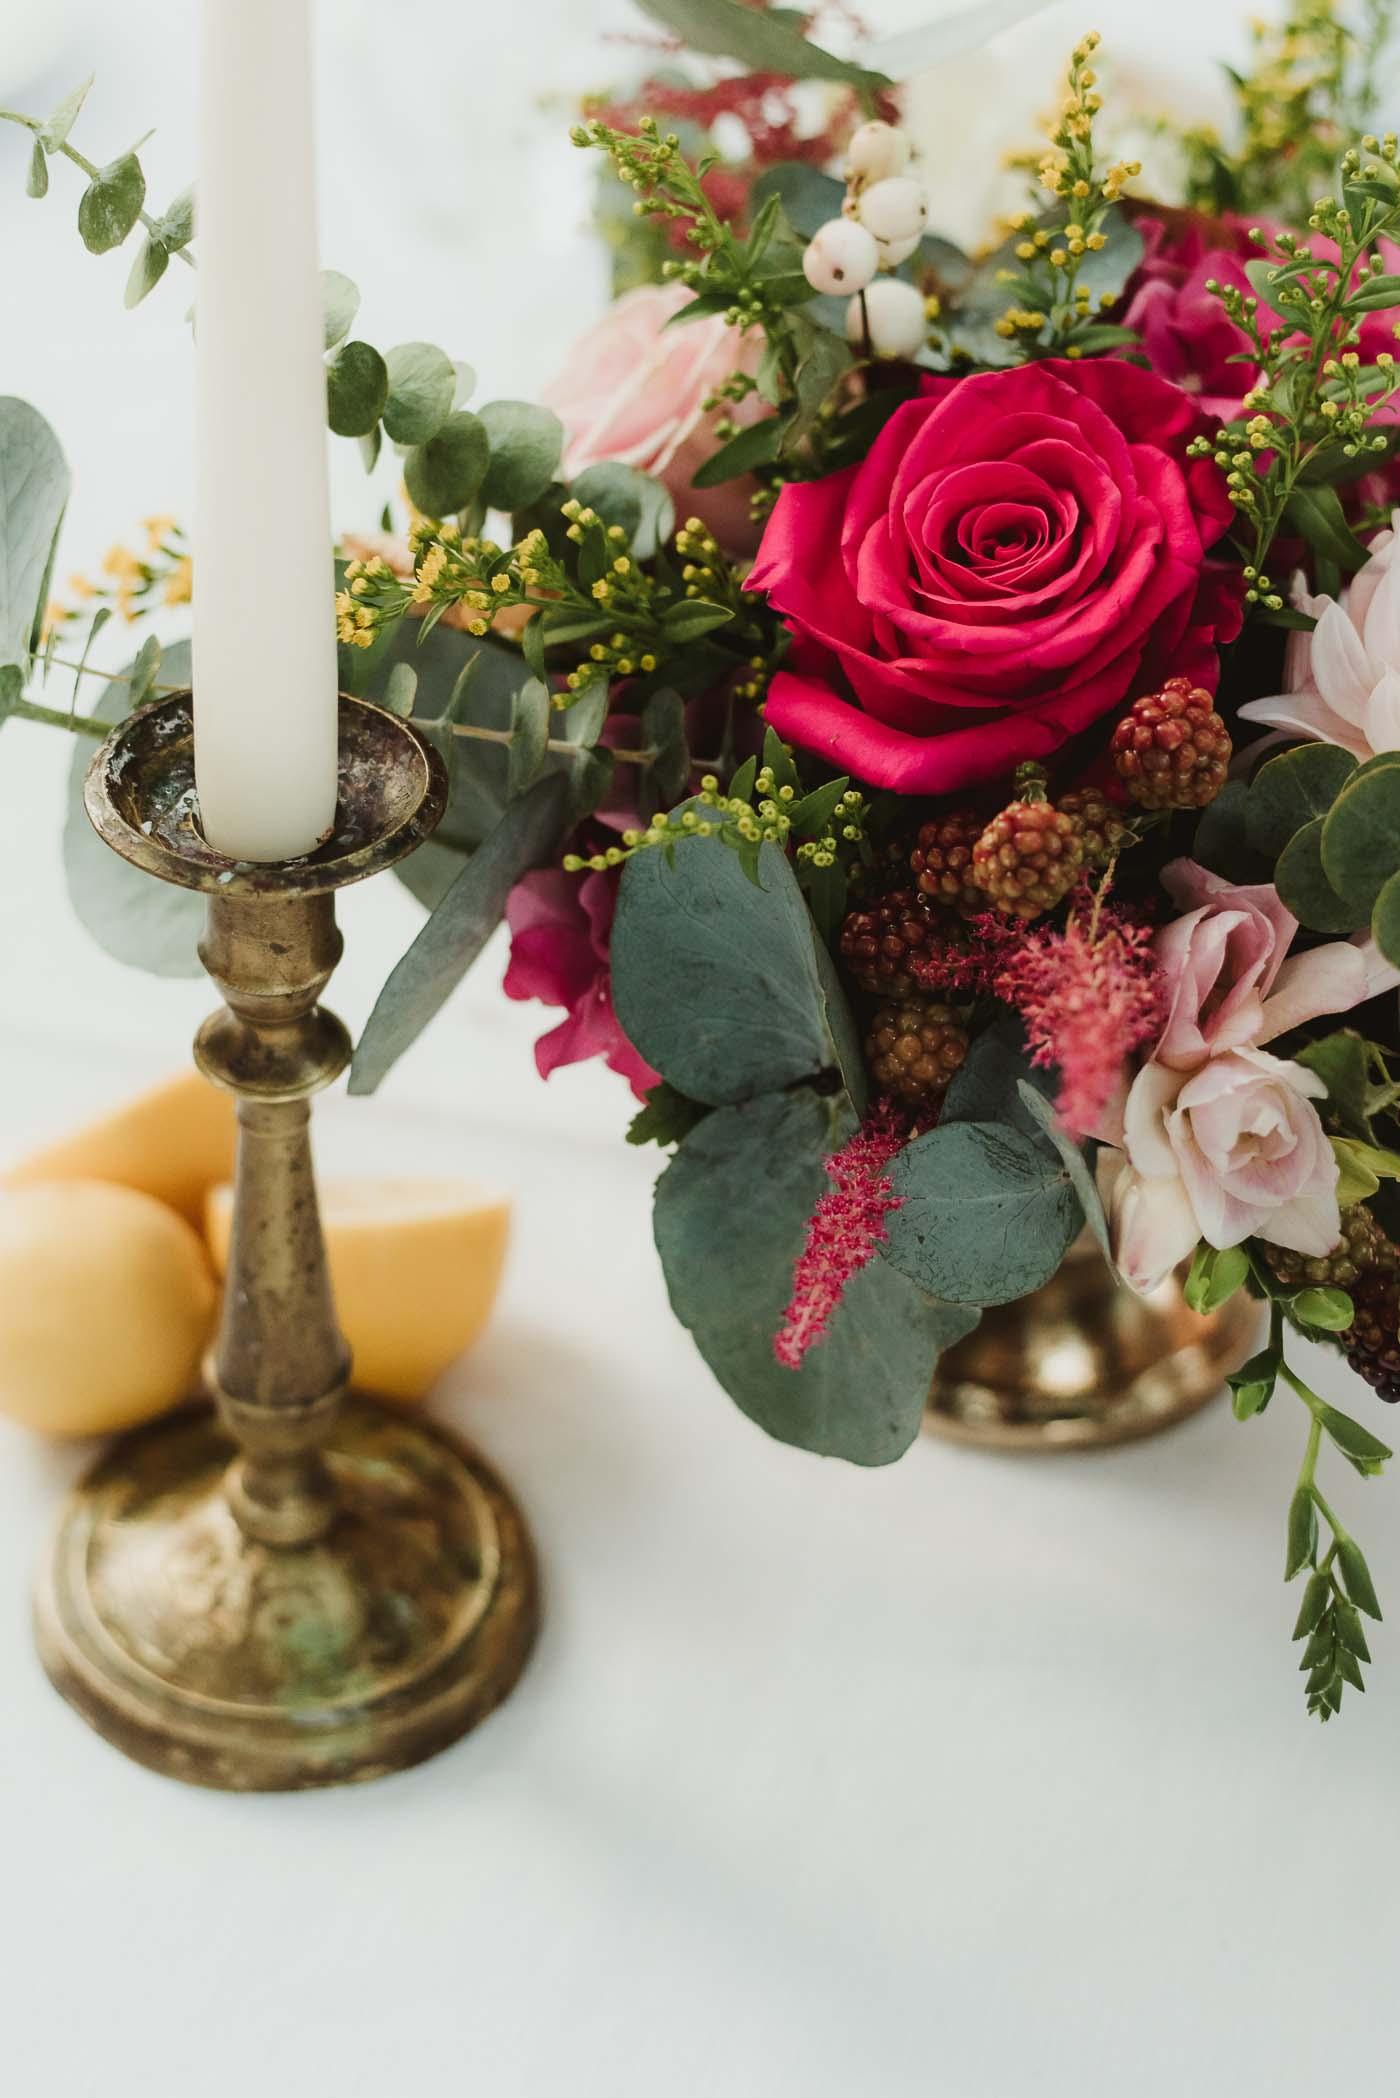 Relaxed-wedding-borgo-stomennano-1180